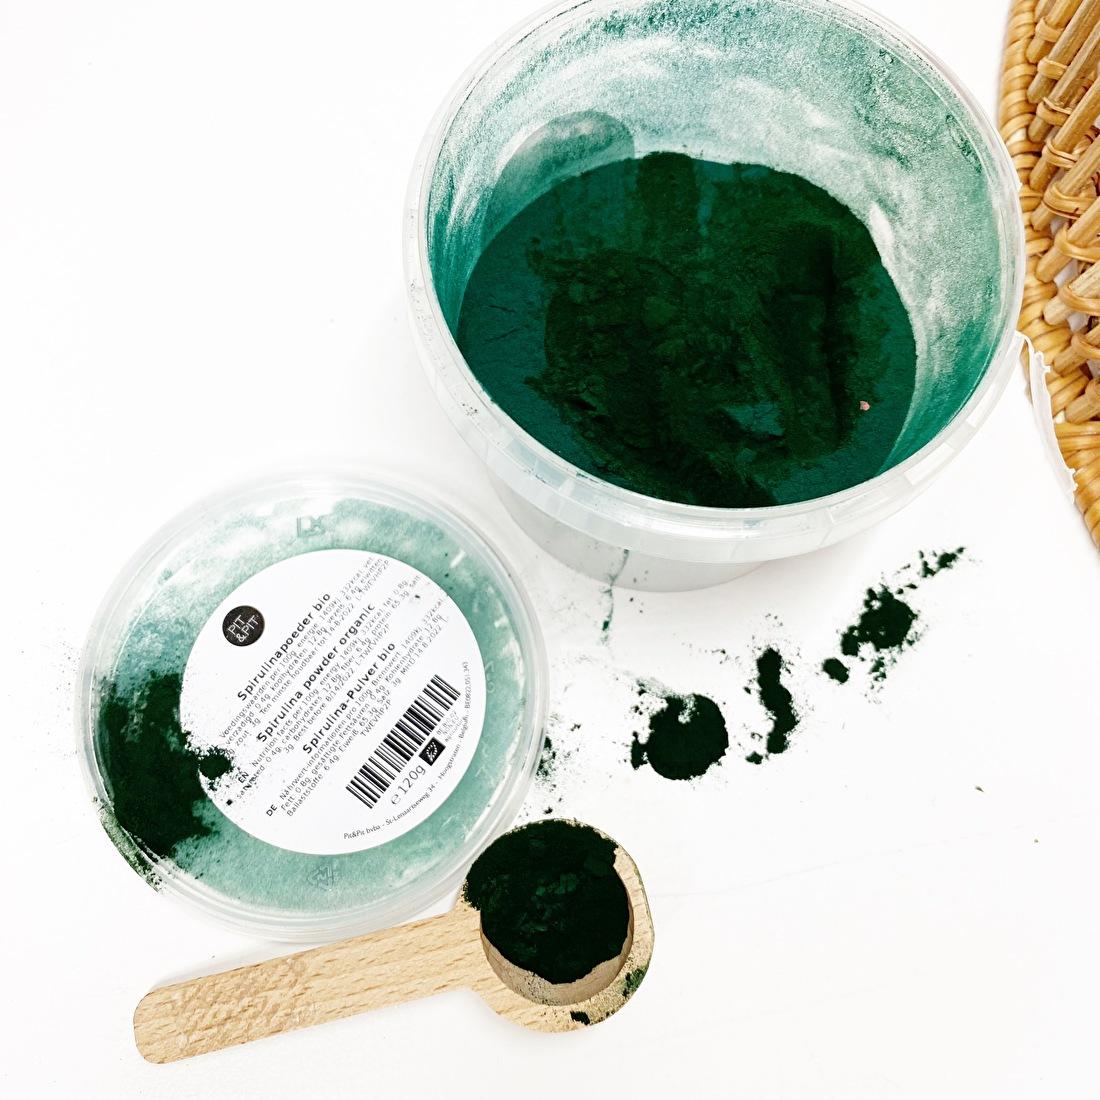 Spirulina alg poeder magie wicca elementen edelstenen maan rituelen by-sas